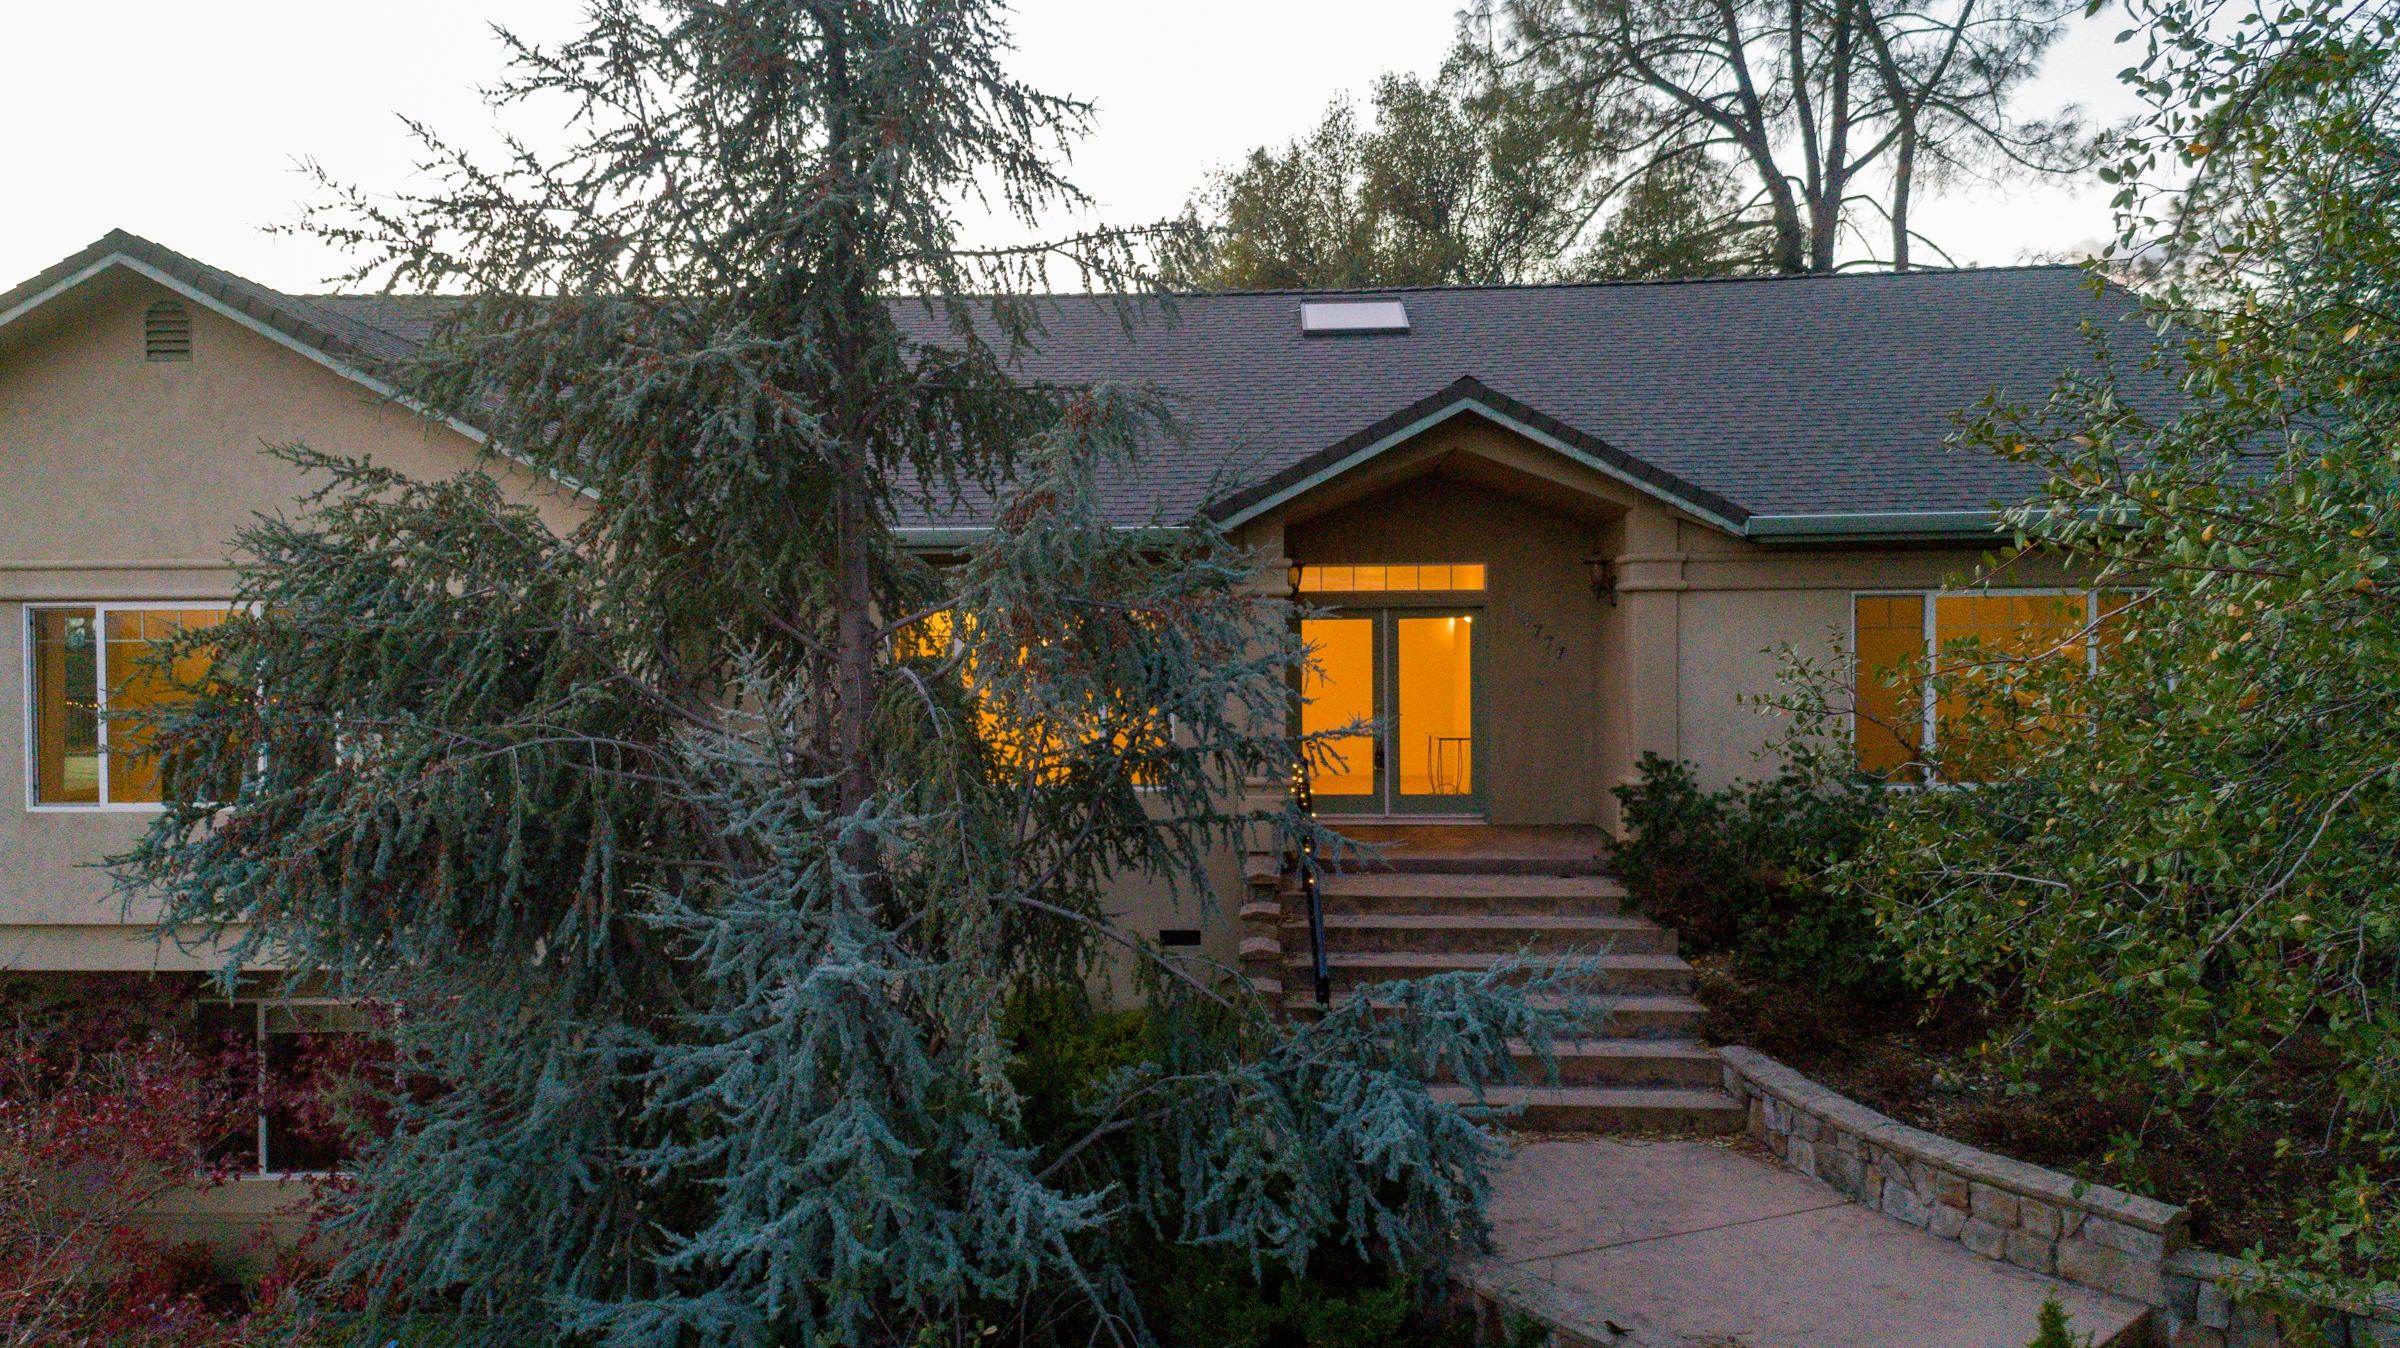 13777 Peace Valley Ln, Redding, CA 96003